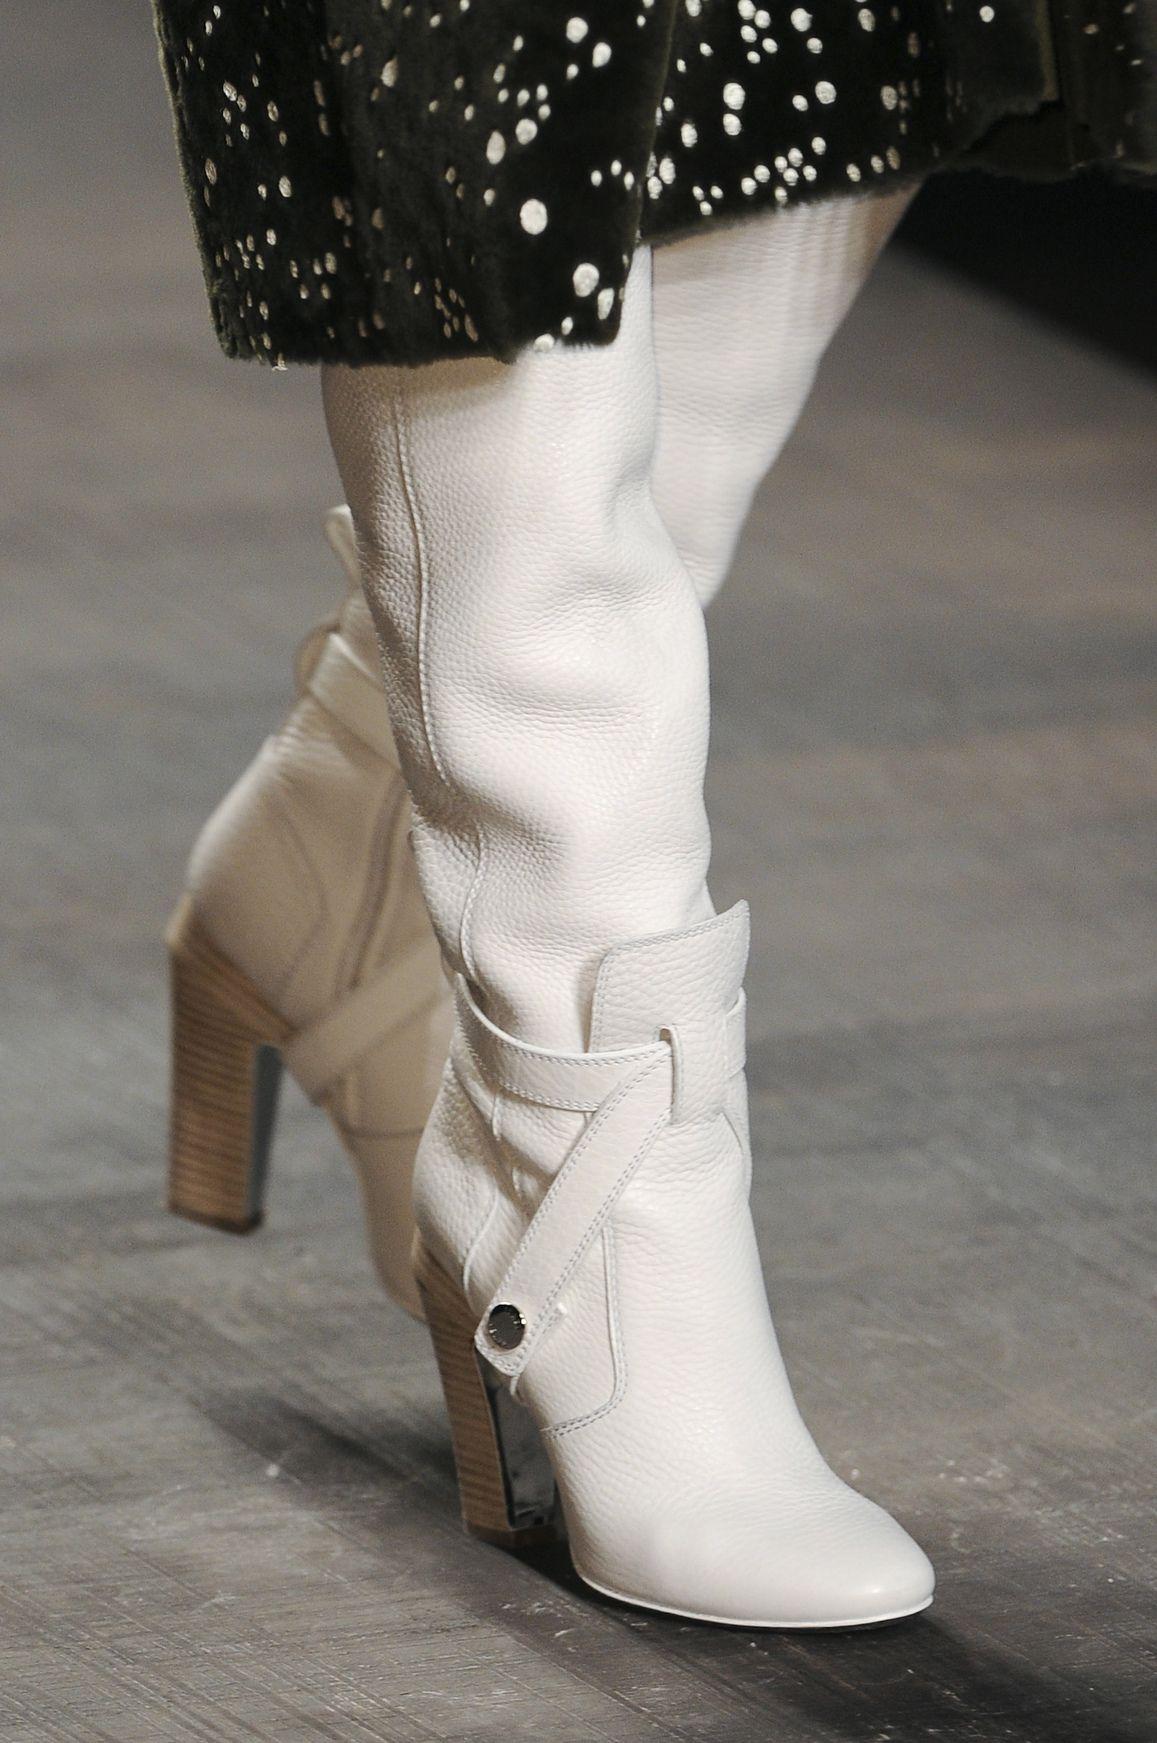 Modne Buty Jesien Zima 2014 2015 Fendi Fot Imaxtree Fendi Milan Fashion Week Fashion